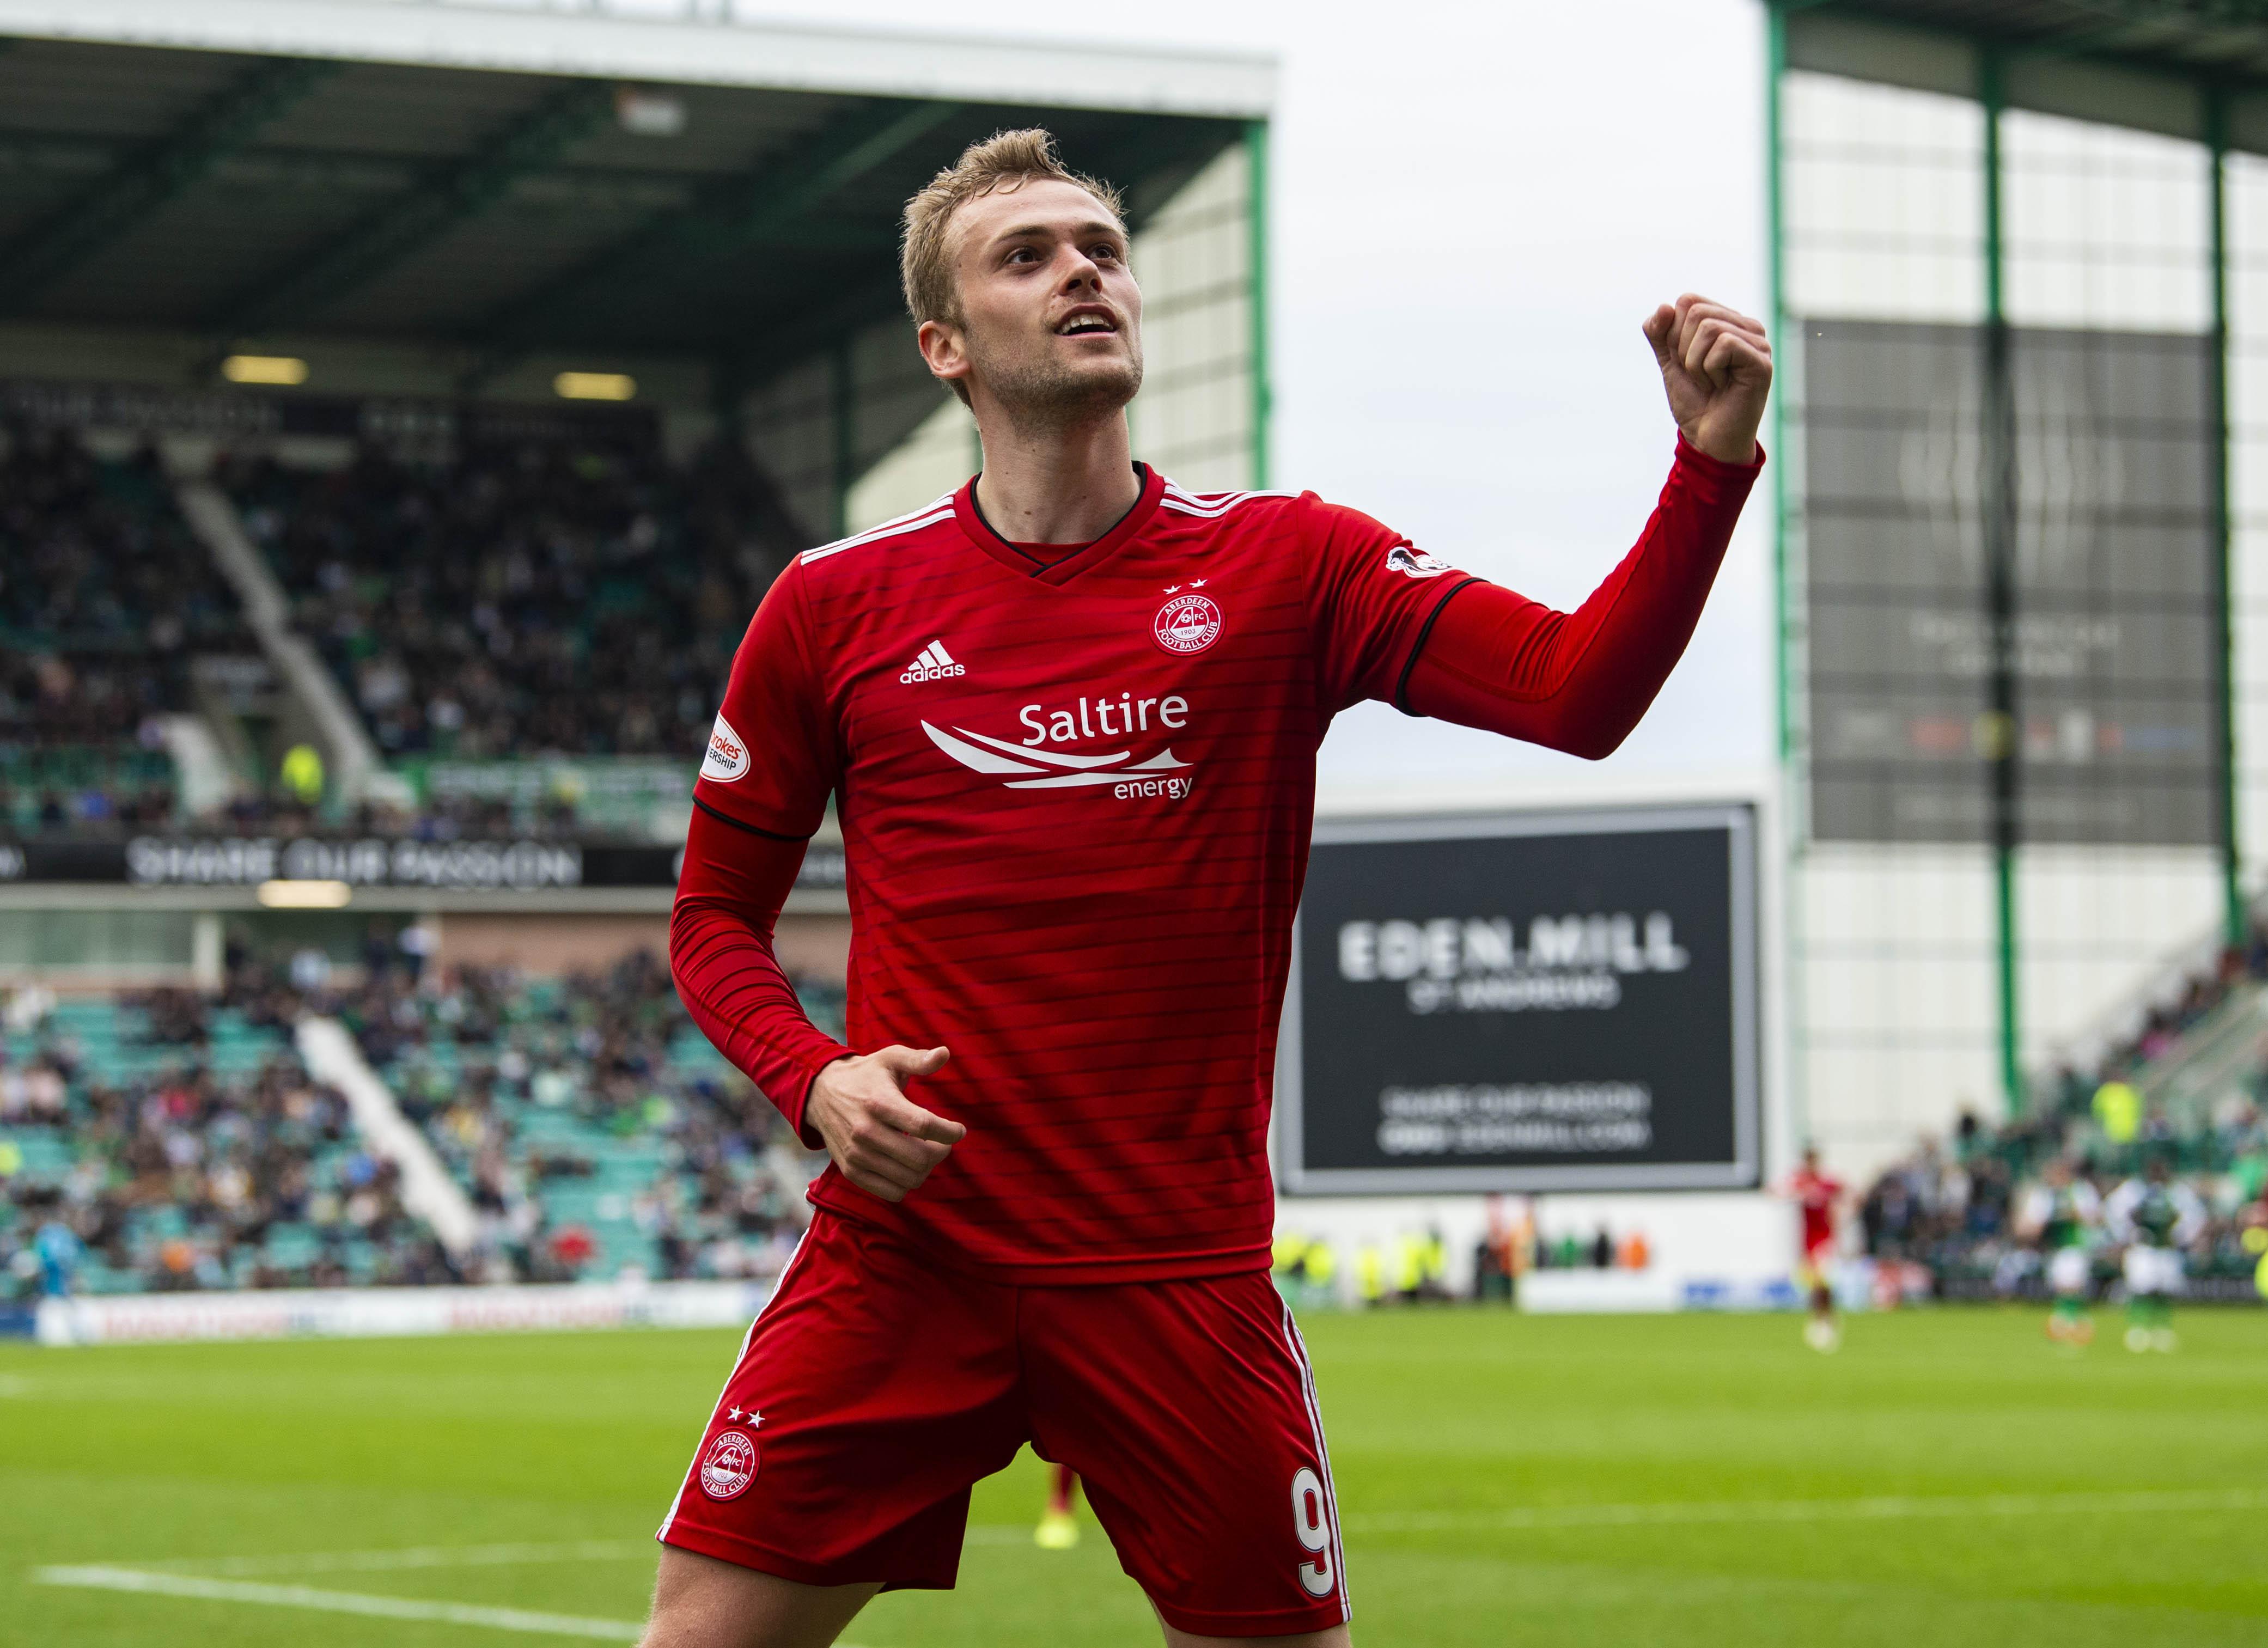 James Wilson scored in his final game for Aberdeen against Hibernian.